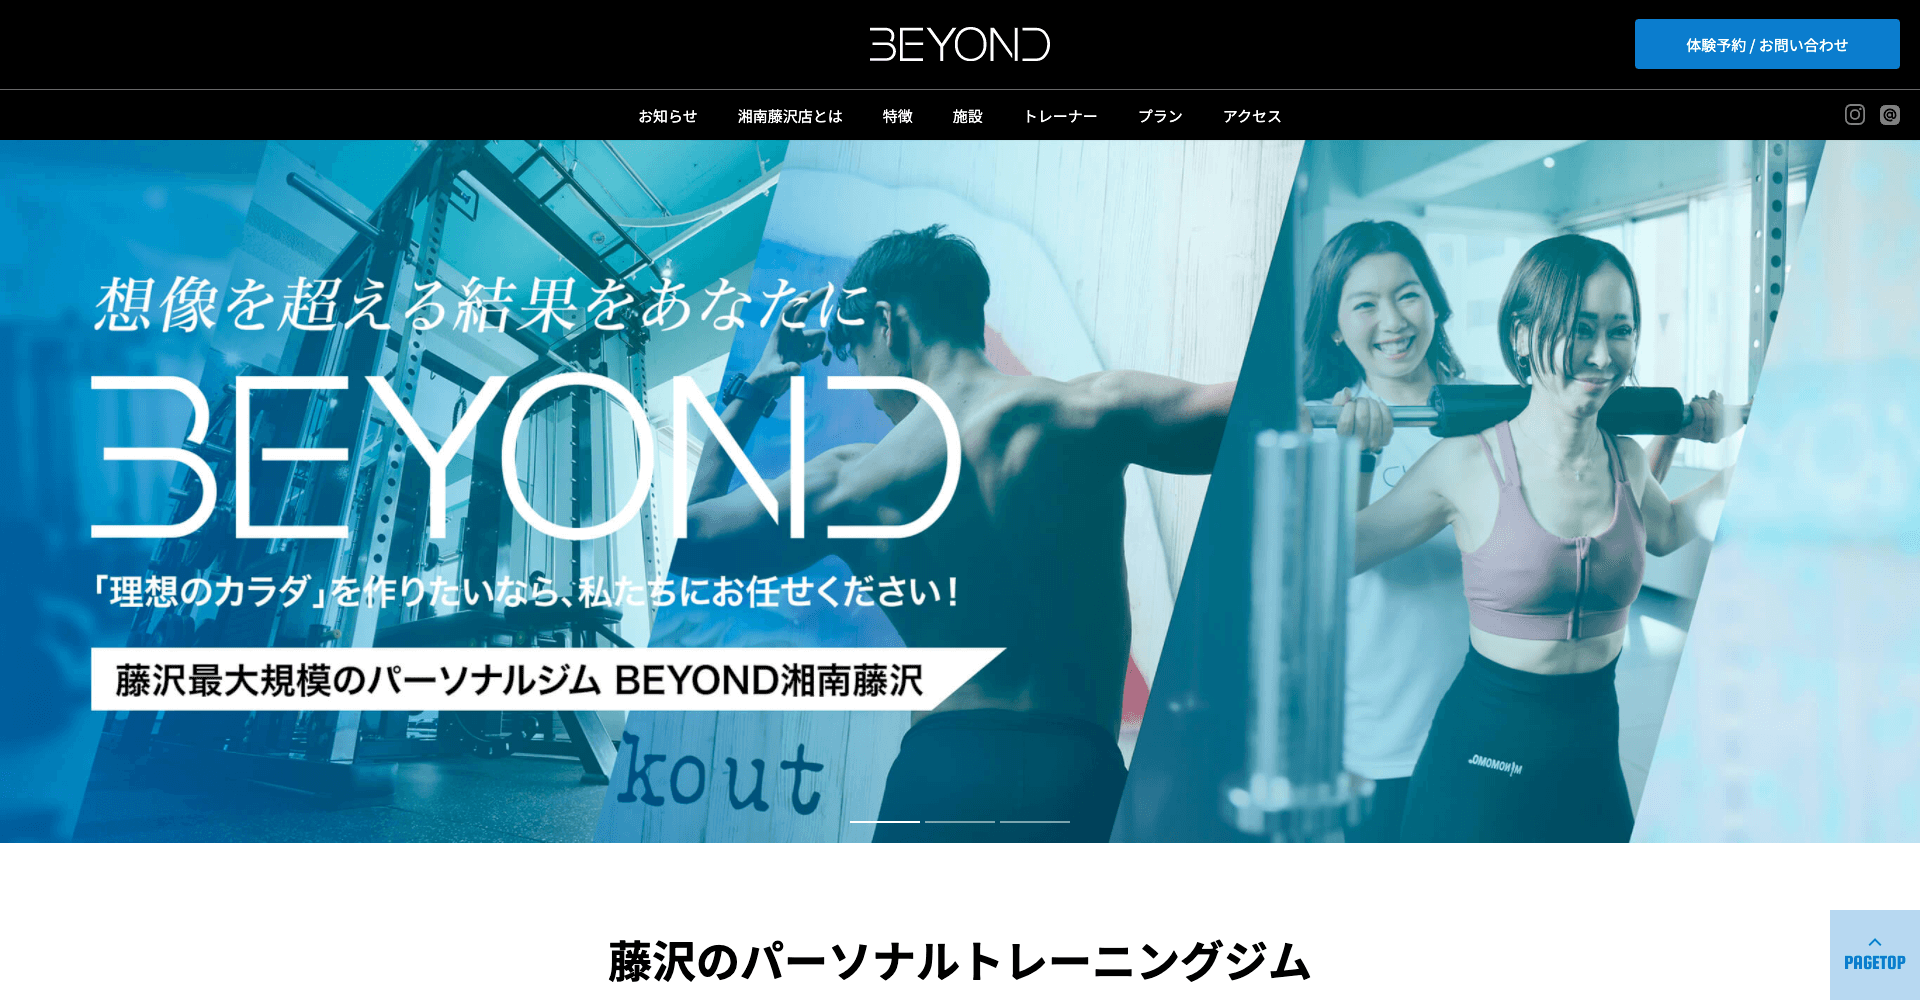 BEYOND(ビヨンド)ジム 湘南藤沢店